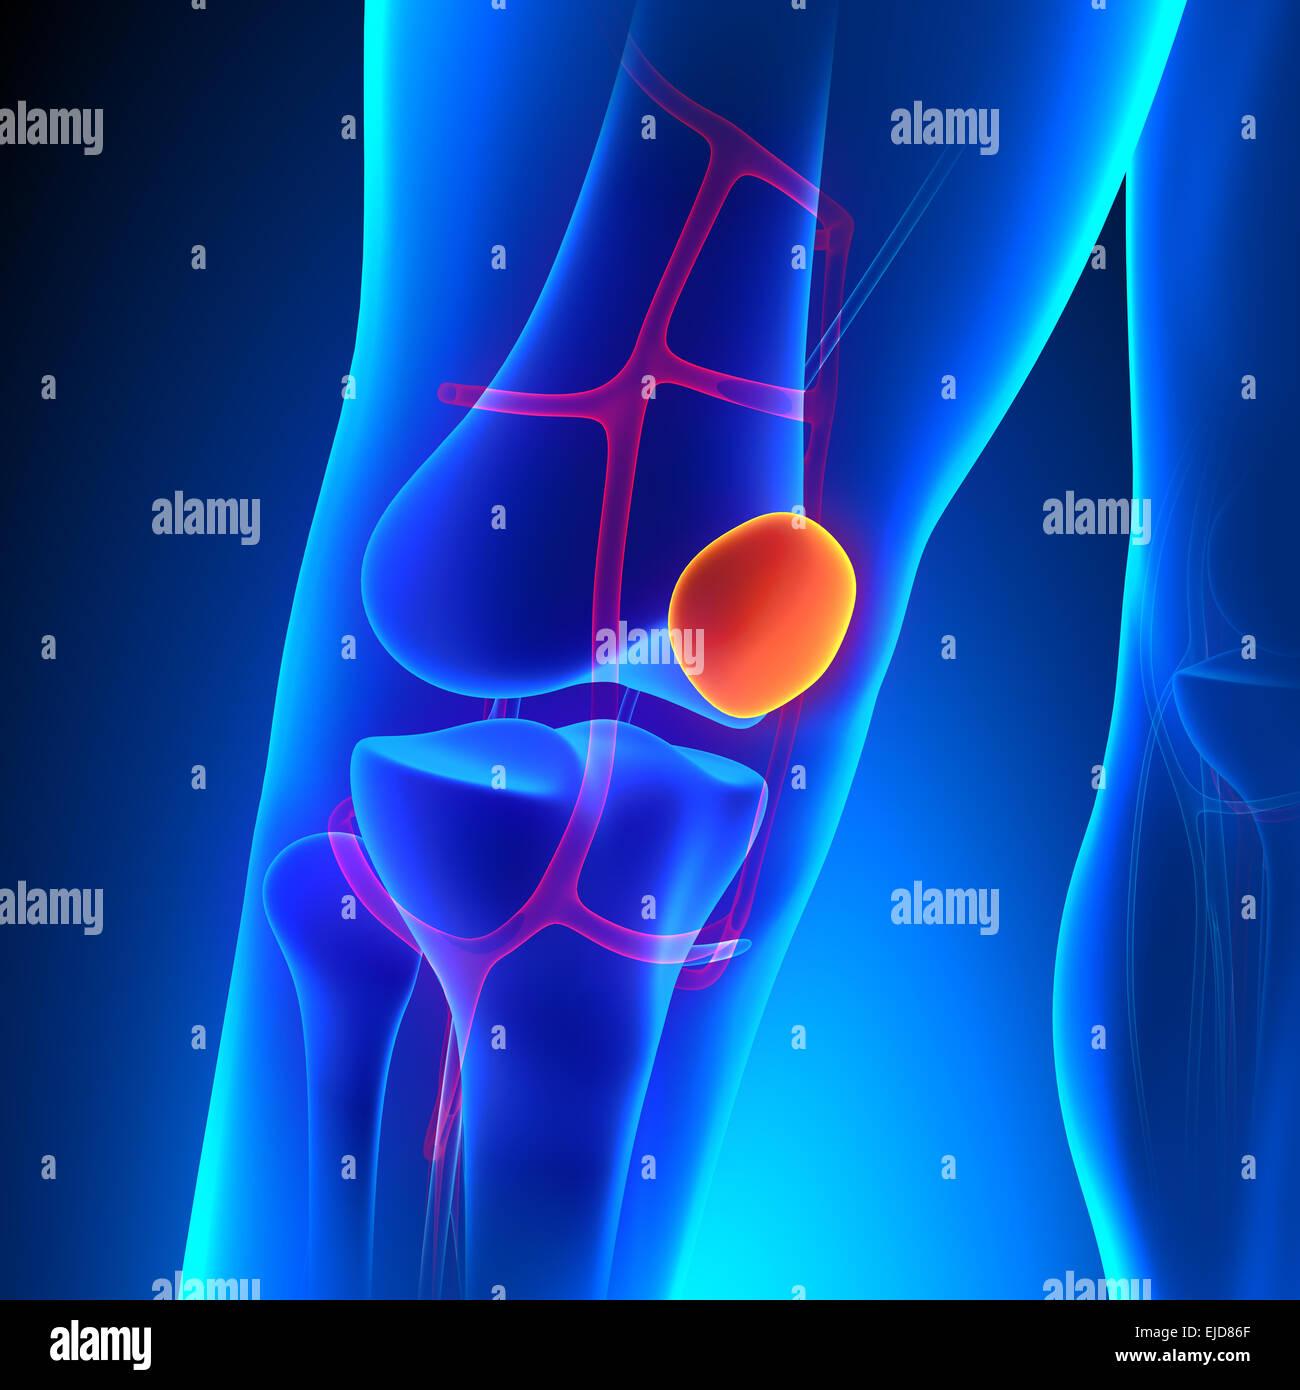 Patella Anatomy Knee Bone with Ciculatory System Stock Photo ...